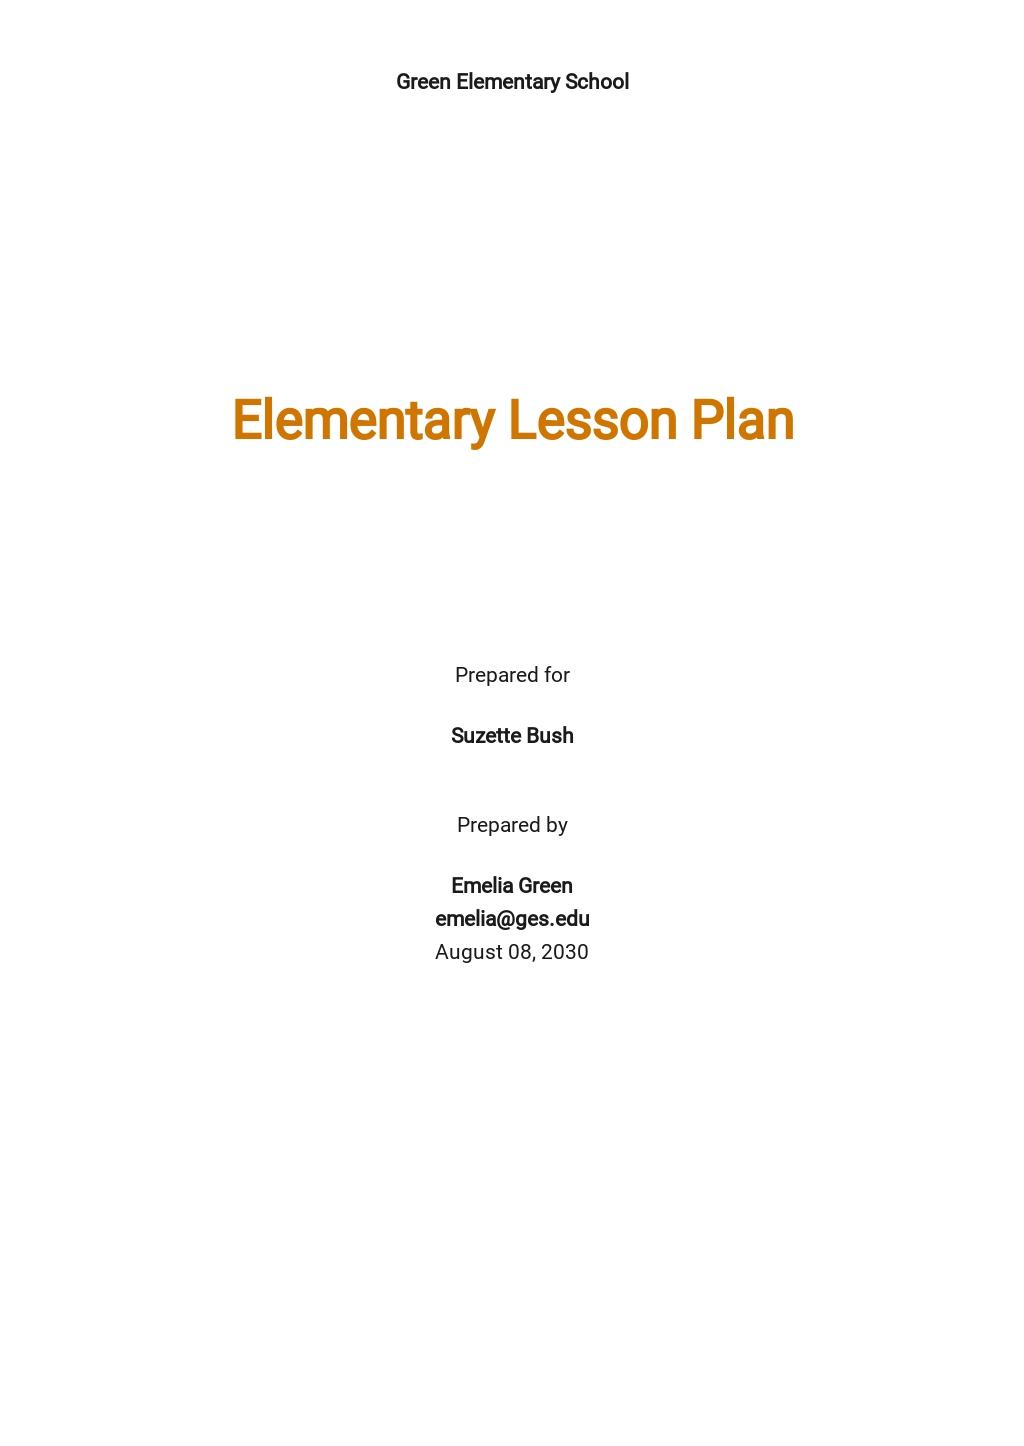 Elementary Lesson Plan Template.jpe